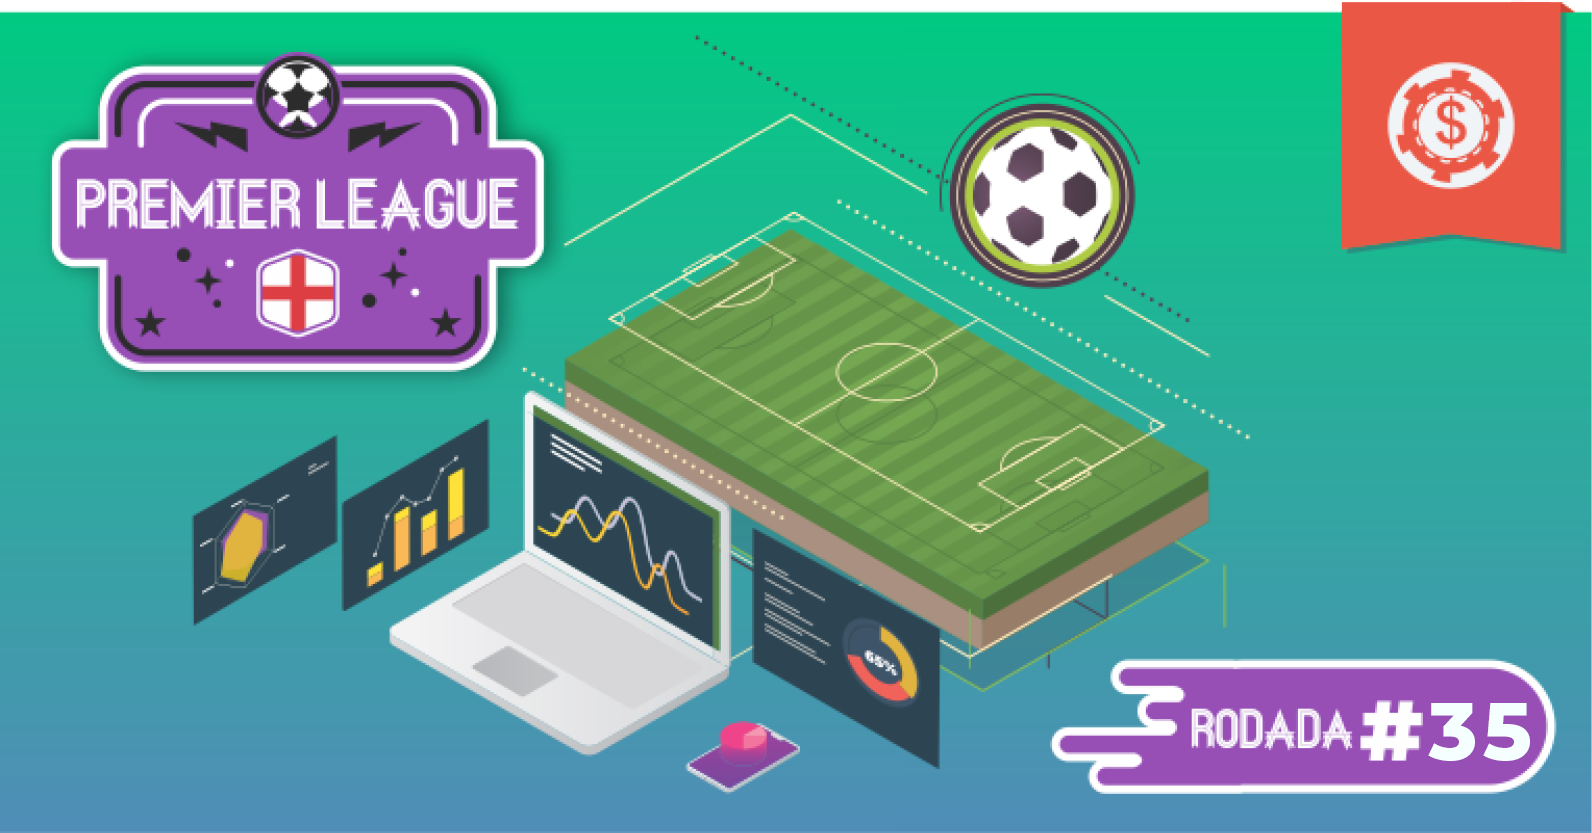 prognosticos-premier-league-campeonato-ingles-apostas-rodada-35